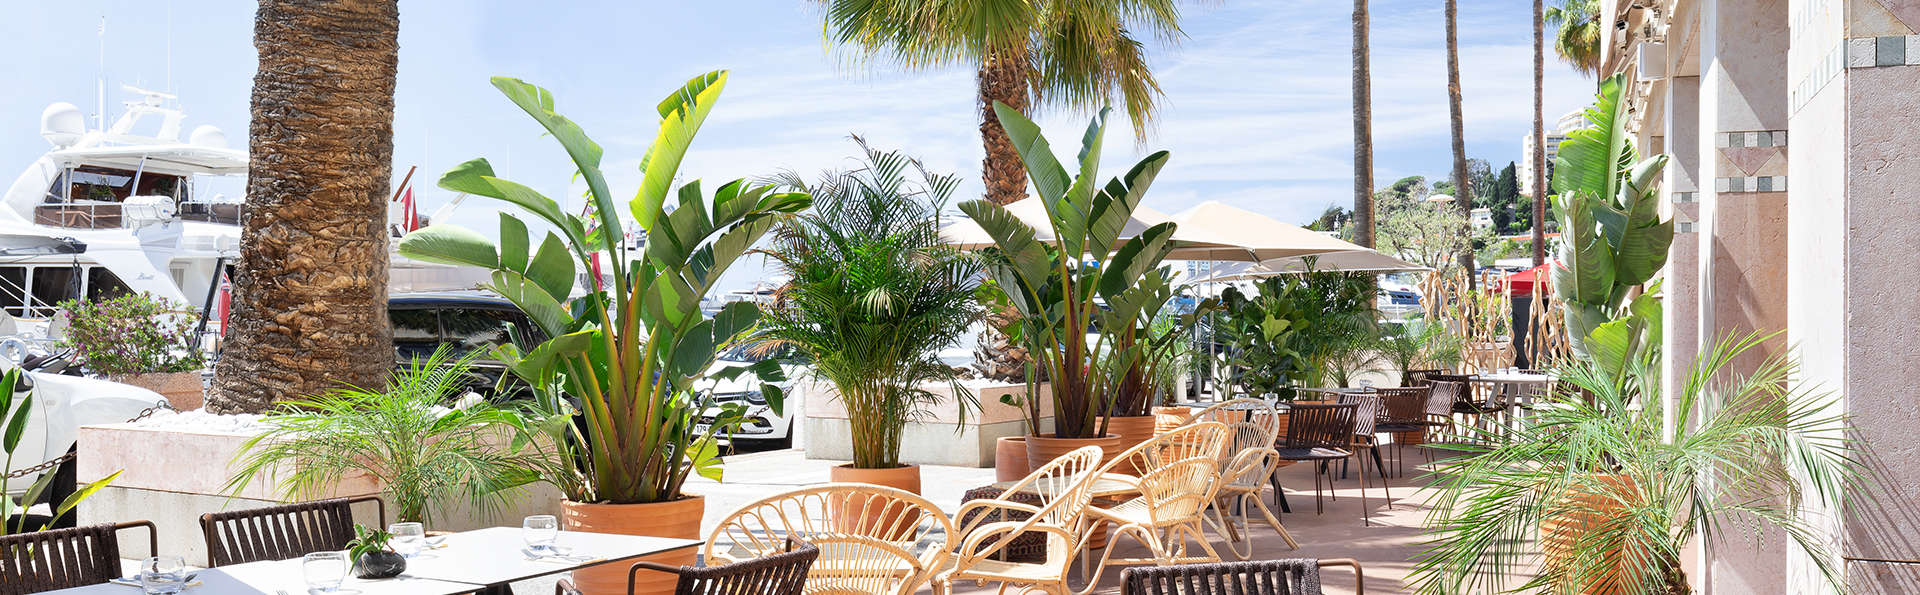 Hôtel Riviera Marriott La Porte de Monaco - EDIT_Restaurant_Exterior.jpg